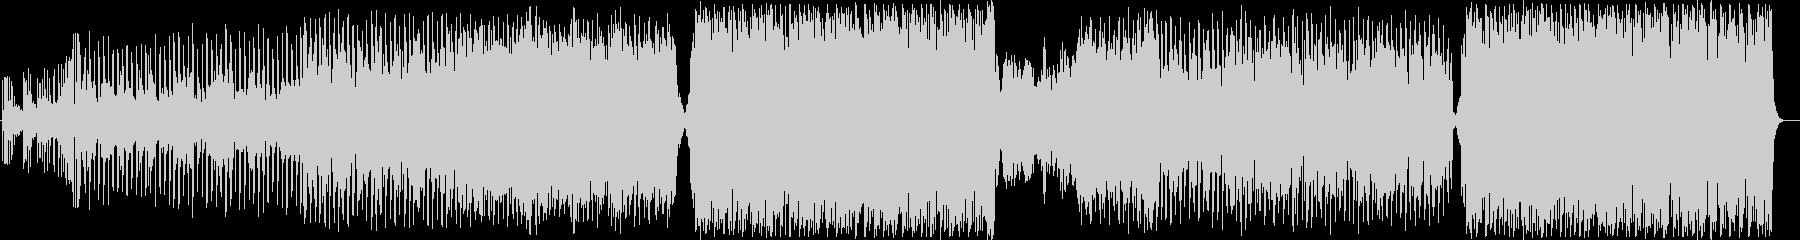 C-POPで暖かい曲の未再生の波形